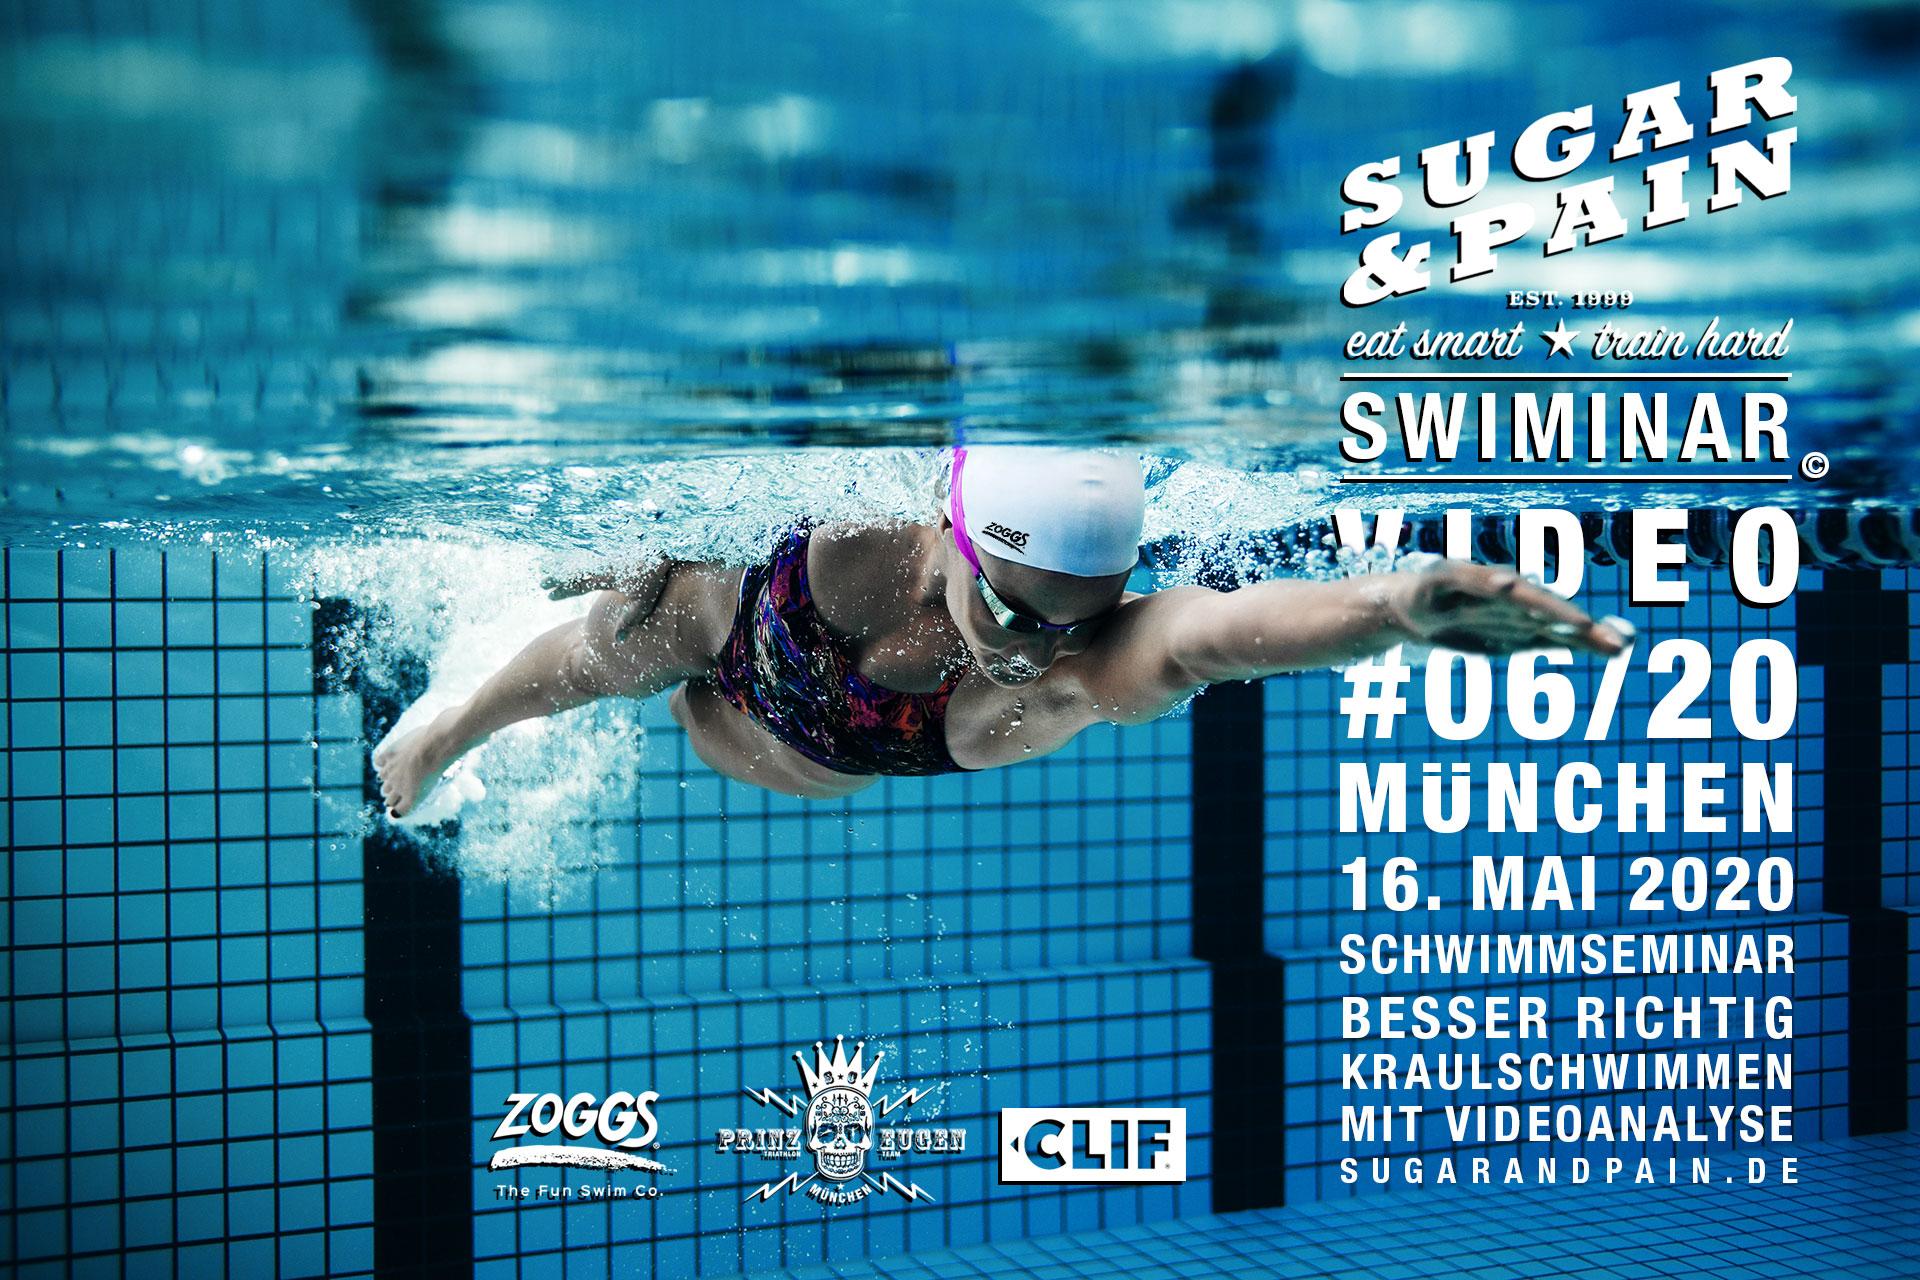 SWIMINAR #06/20 VIDEO Besser richtig Kraulschwimmen am 16. Mai 2020 TITEL © sugarandpain.de / Adobe Stock